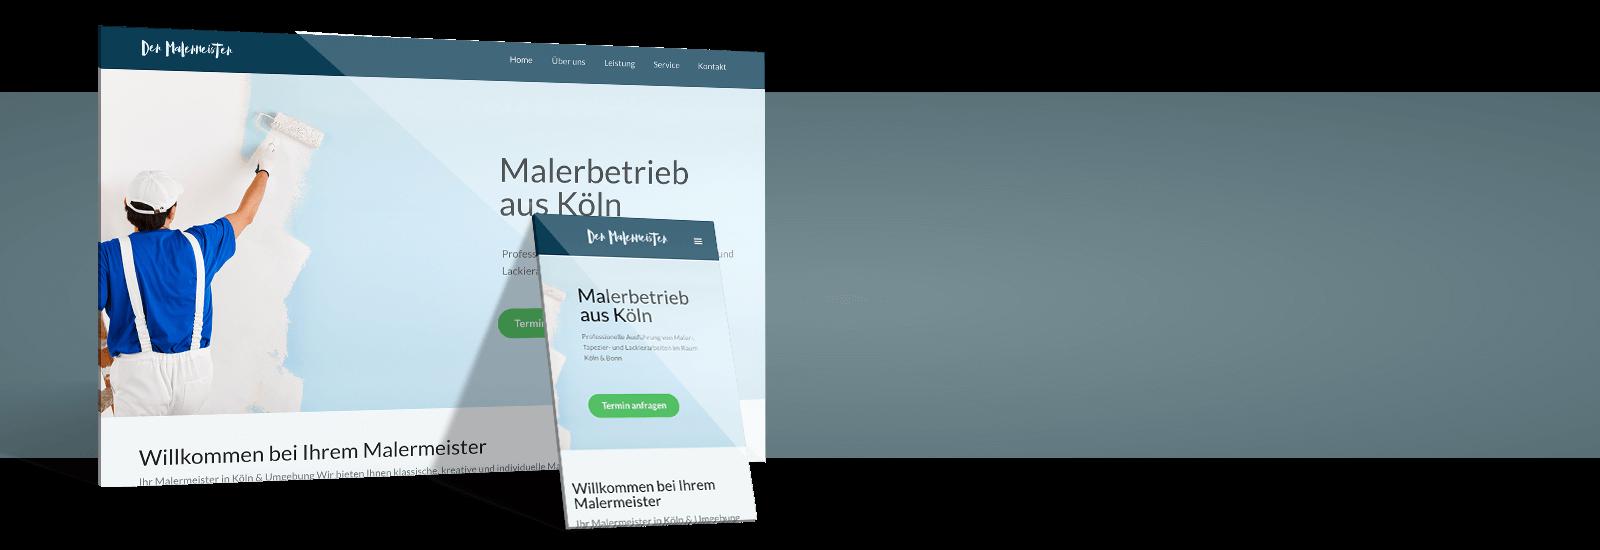 Professionelle Maler Website